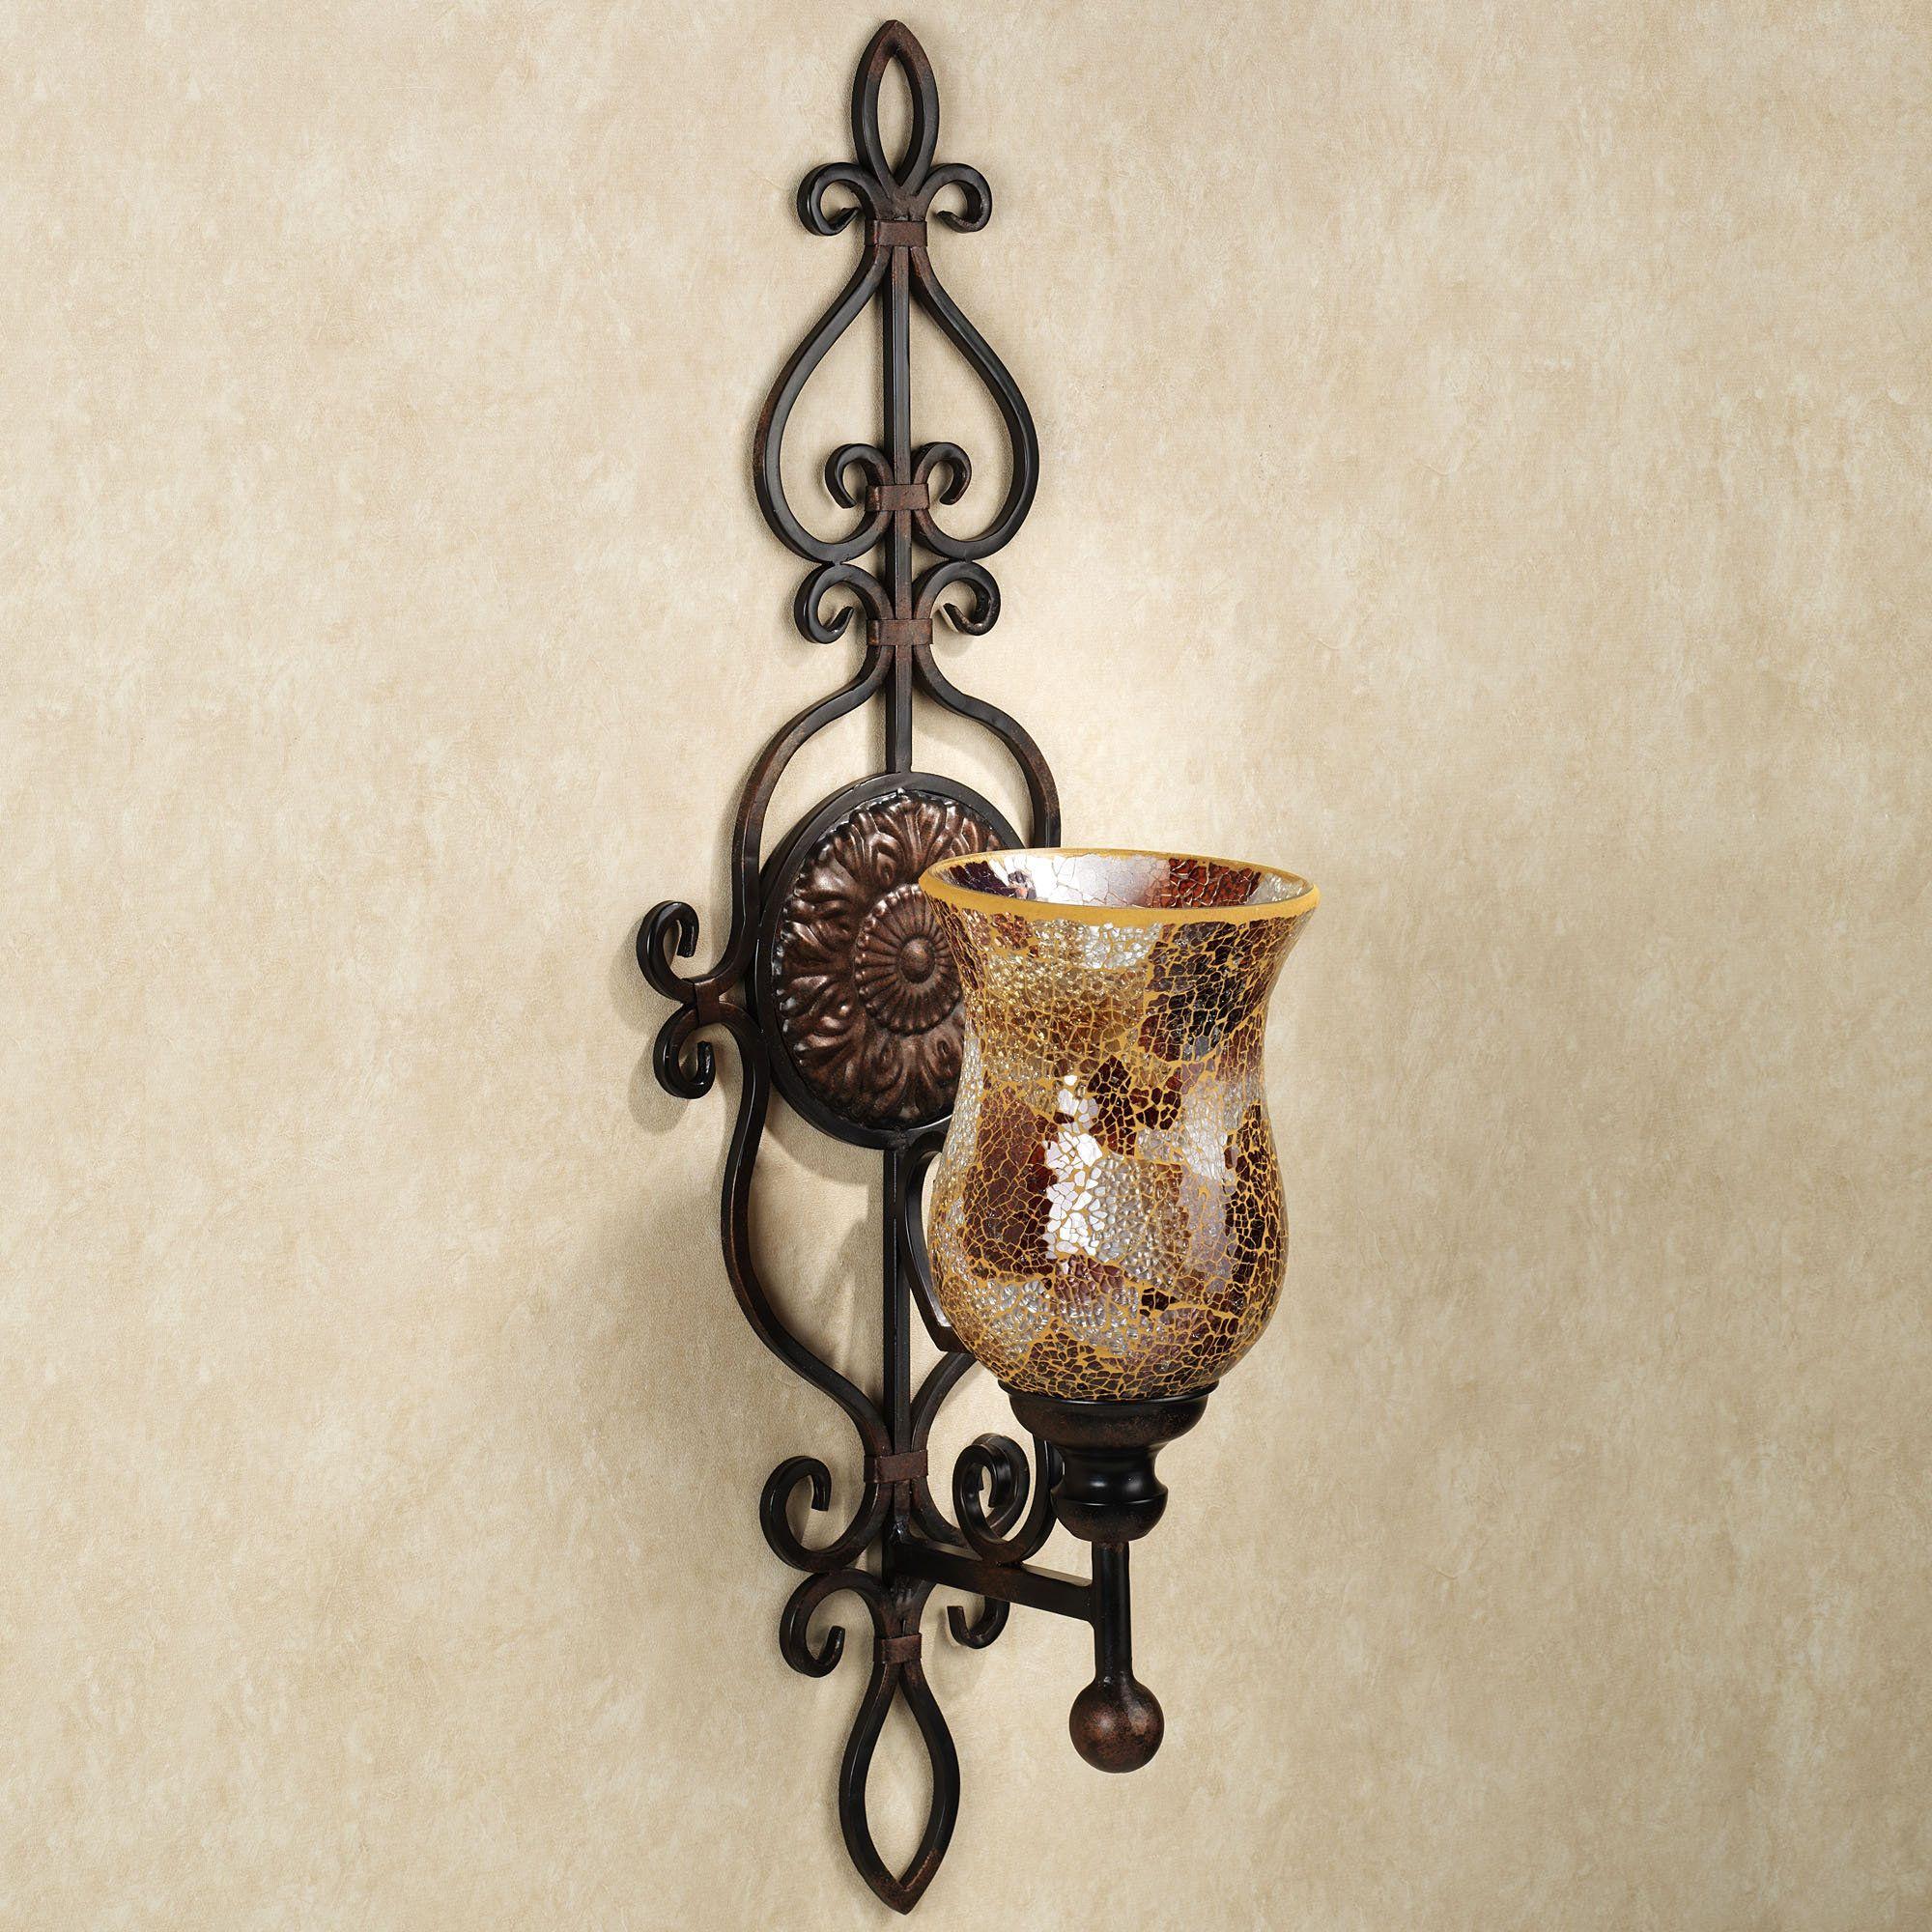 Leyanna Mosaic Aged Brown Wall Sconce Pair